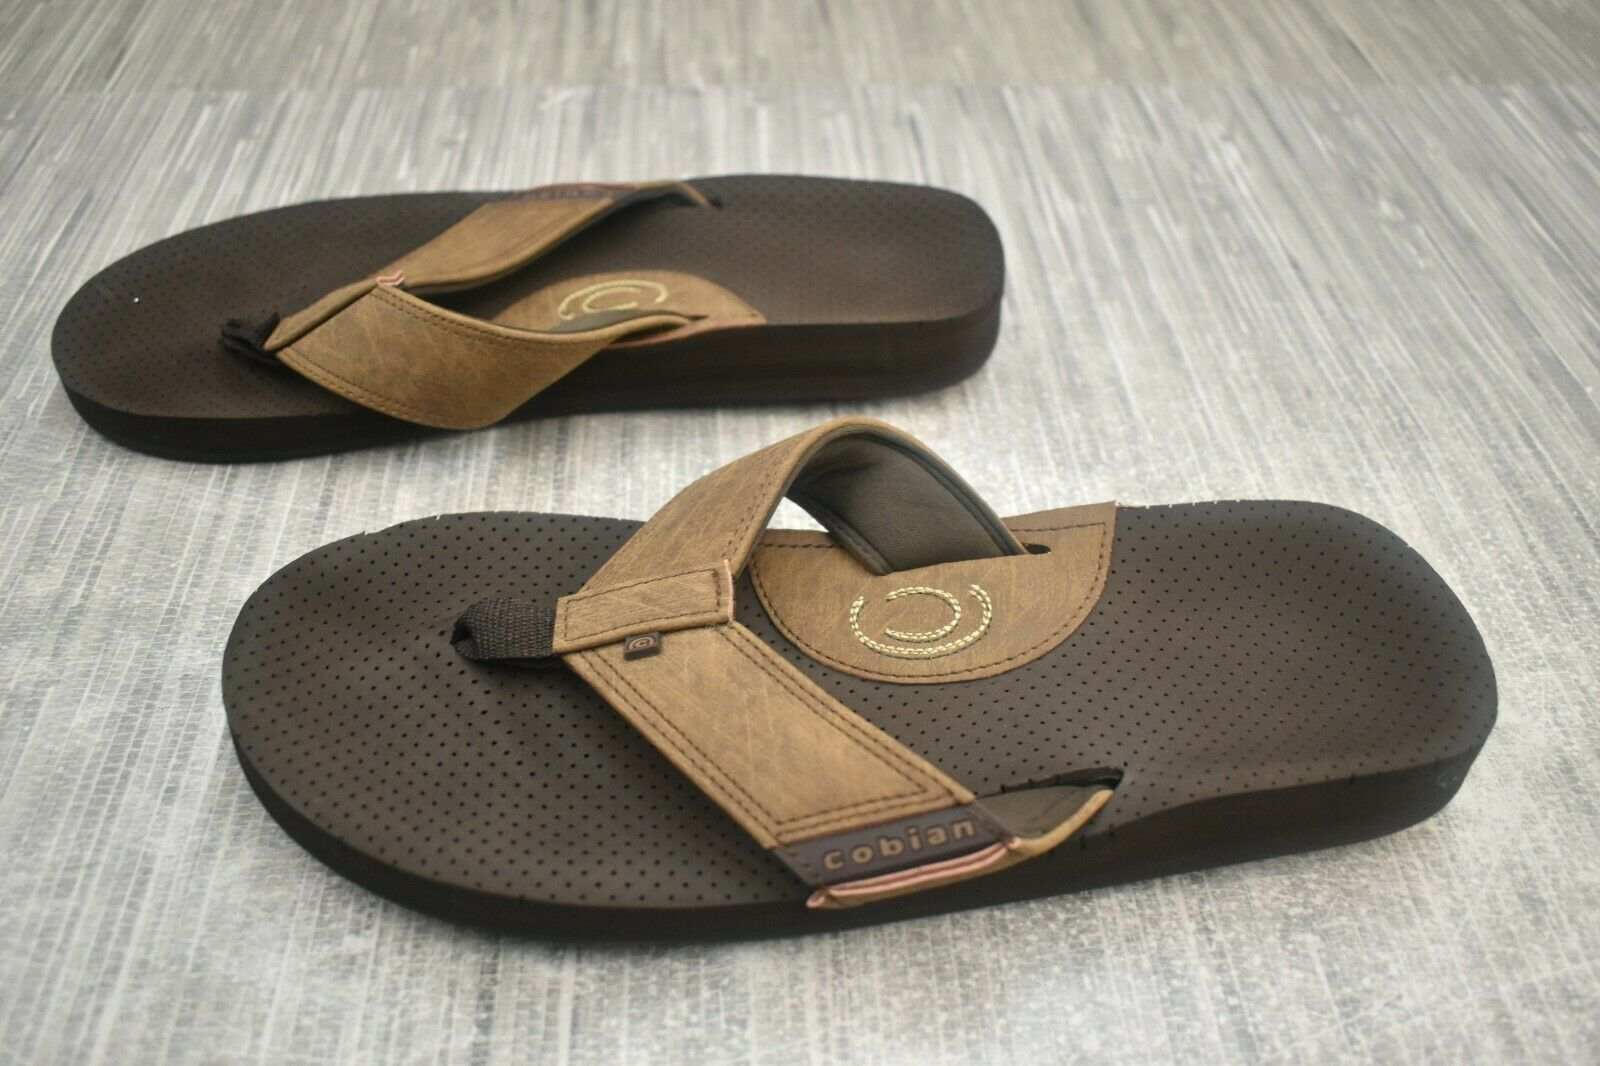 Cobian Mens Sandals ARV 2 Java Size 10